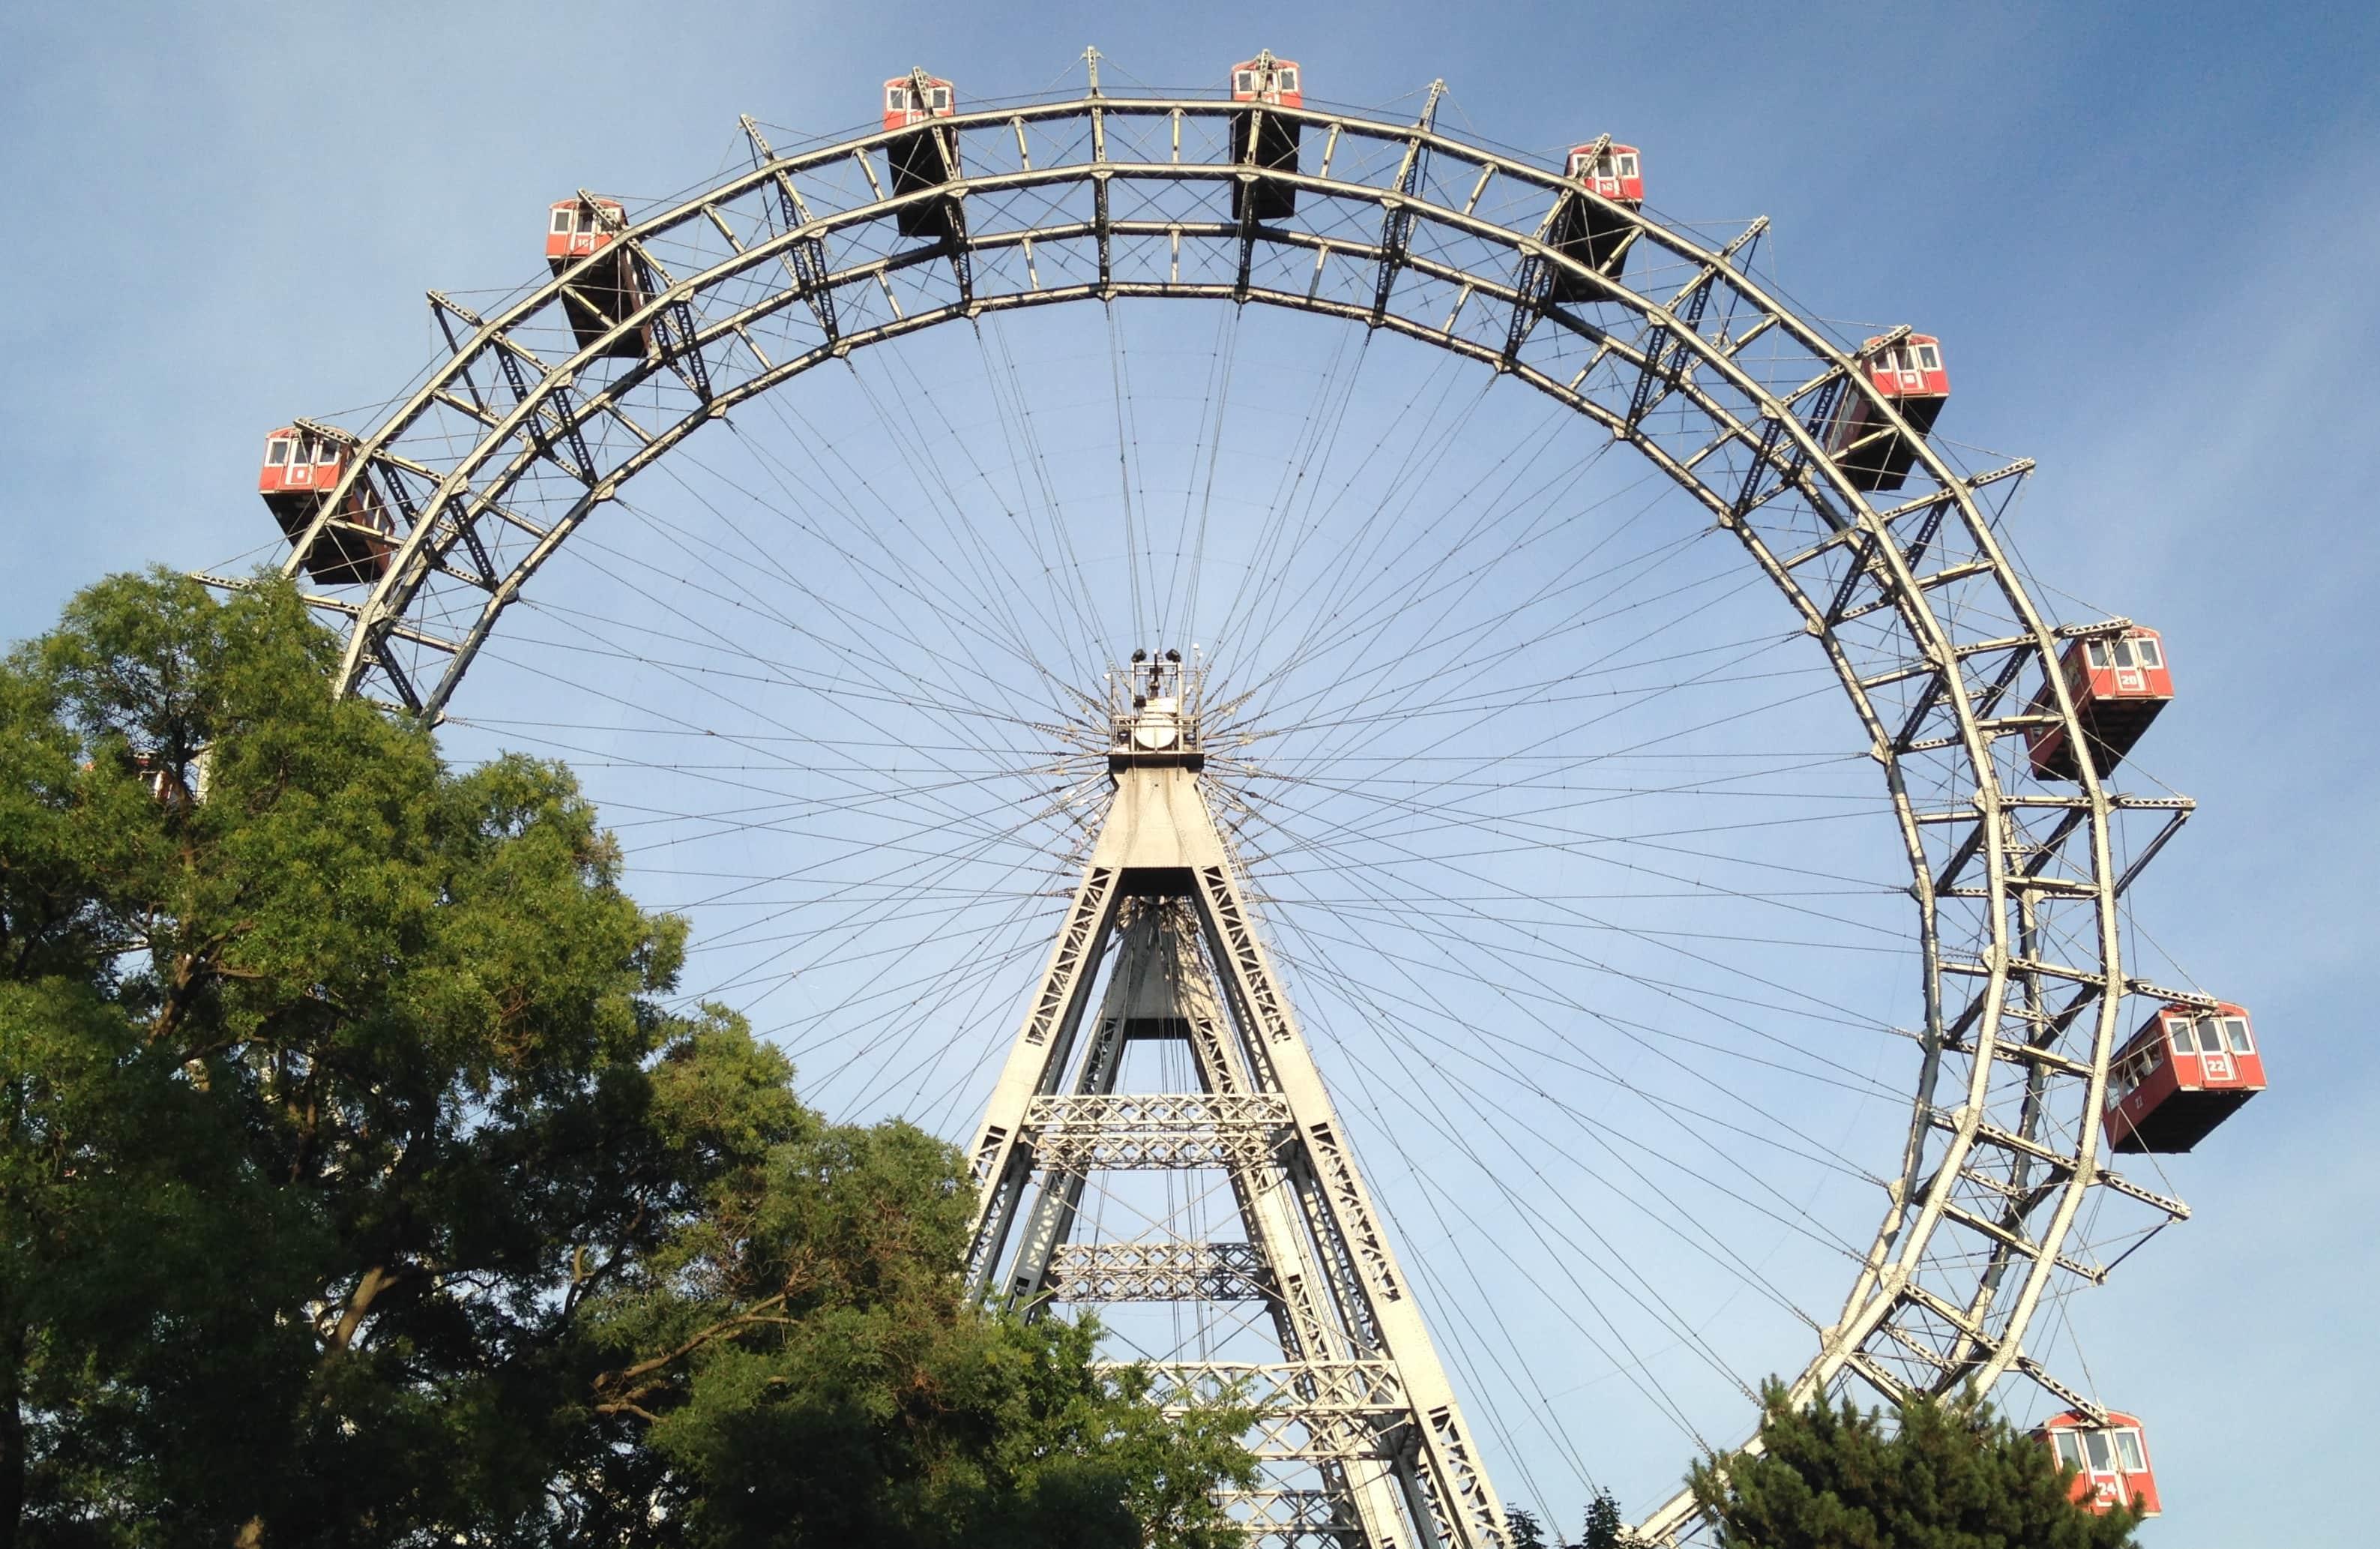 Riesenrad in Wien, Prater